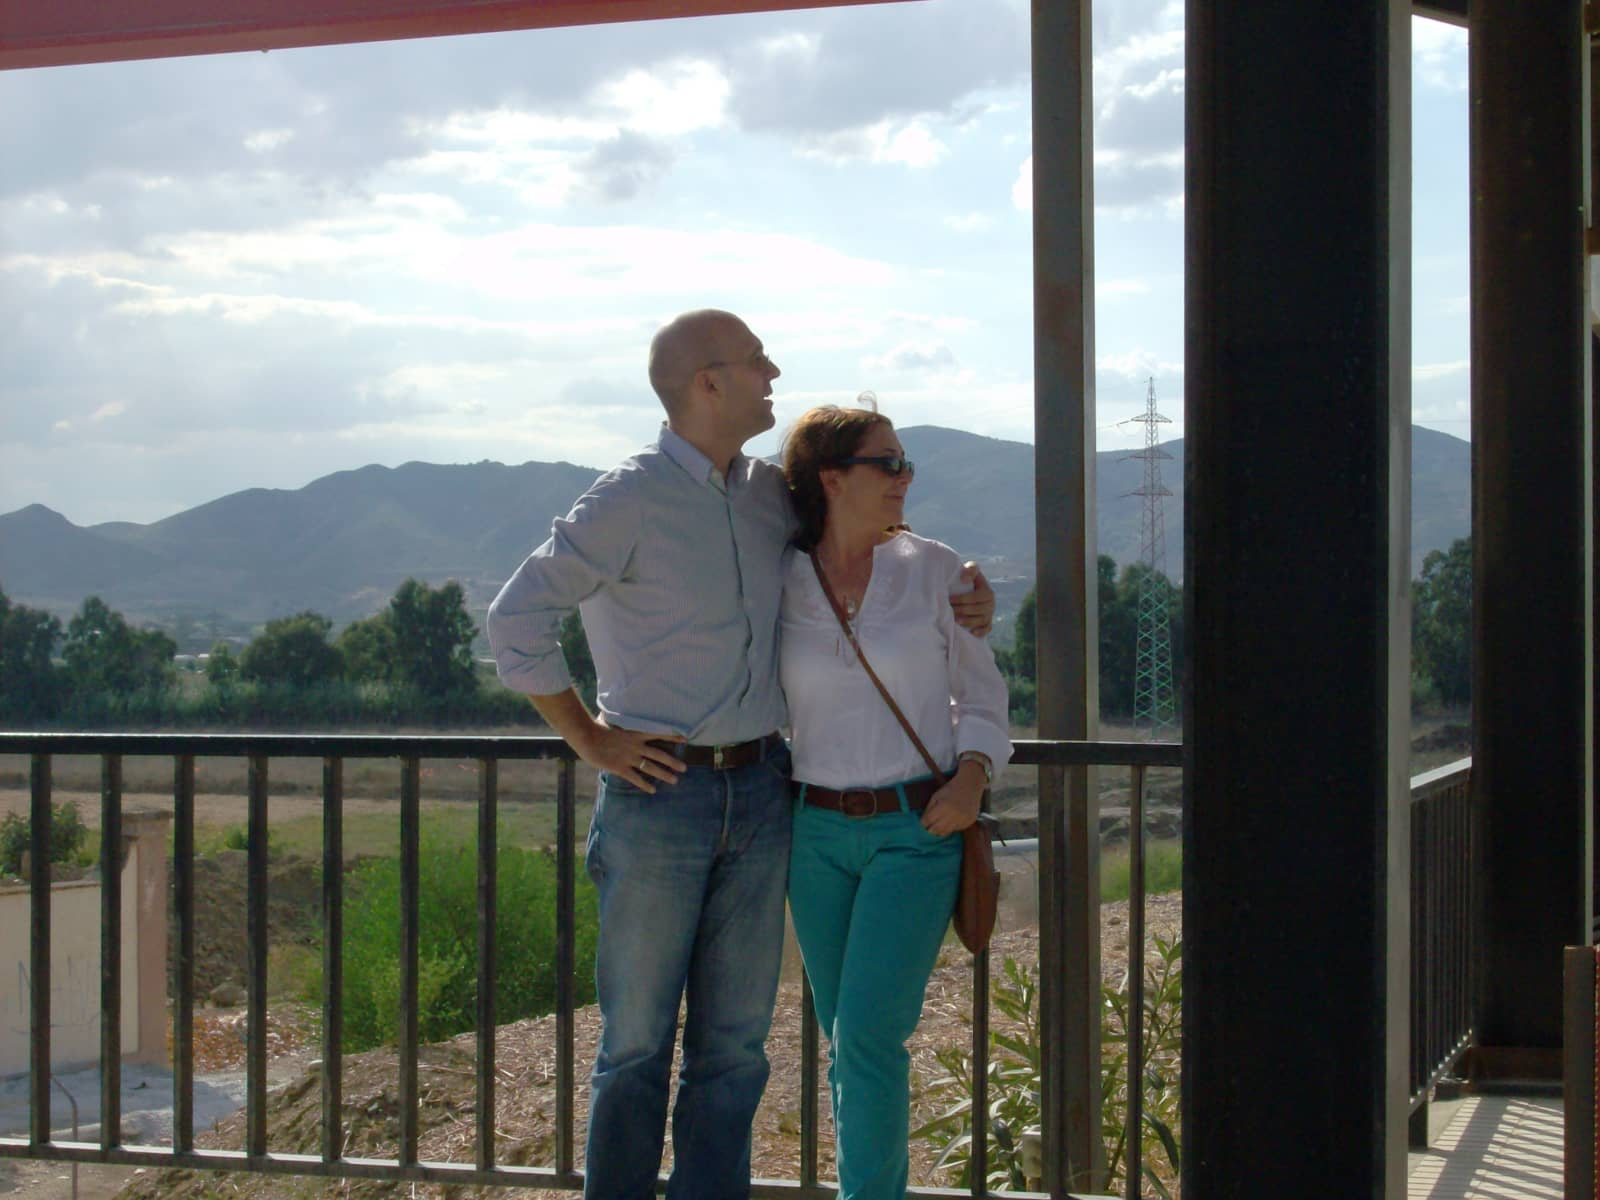 E. & J. from Madrid, Spain